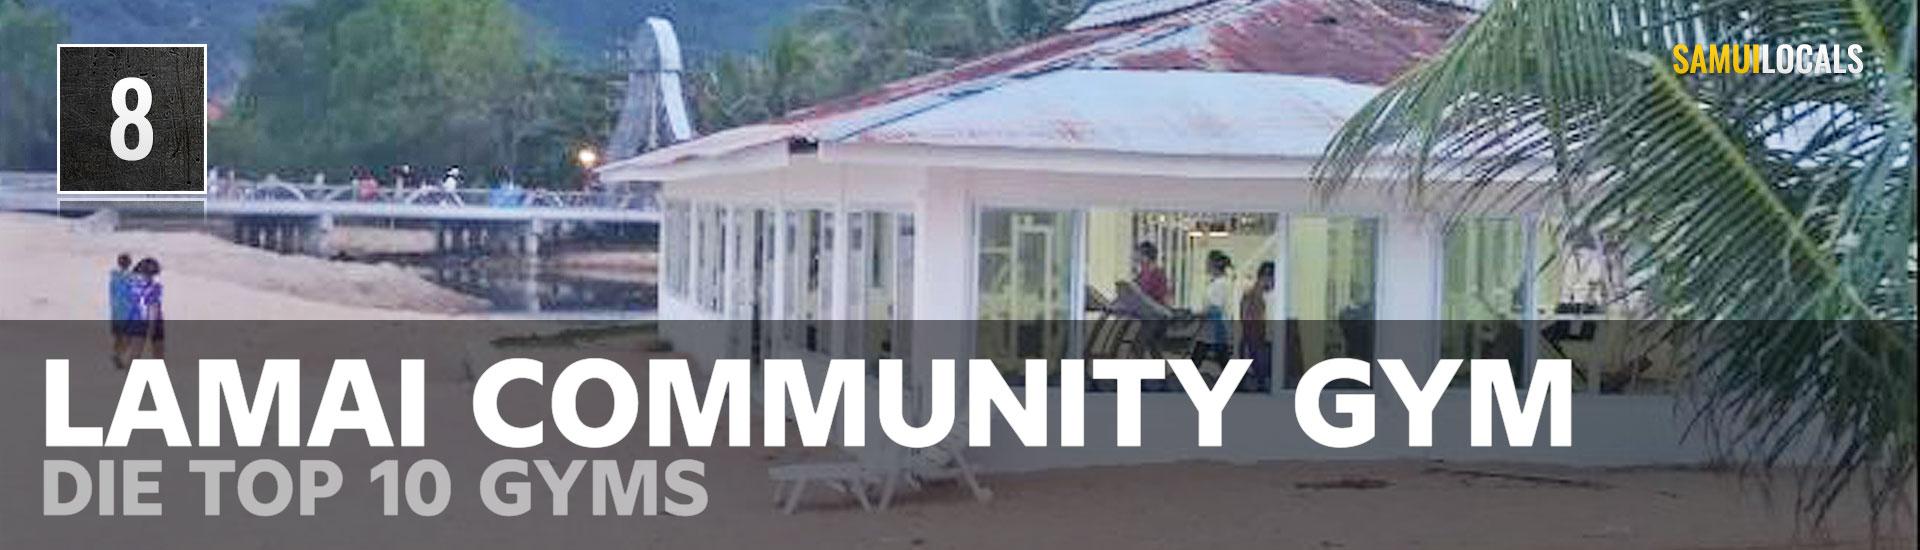 Top_10_gyms_community_gym_lamai